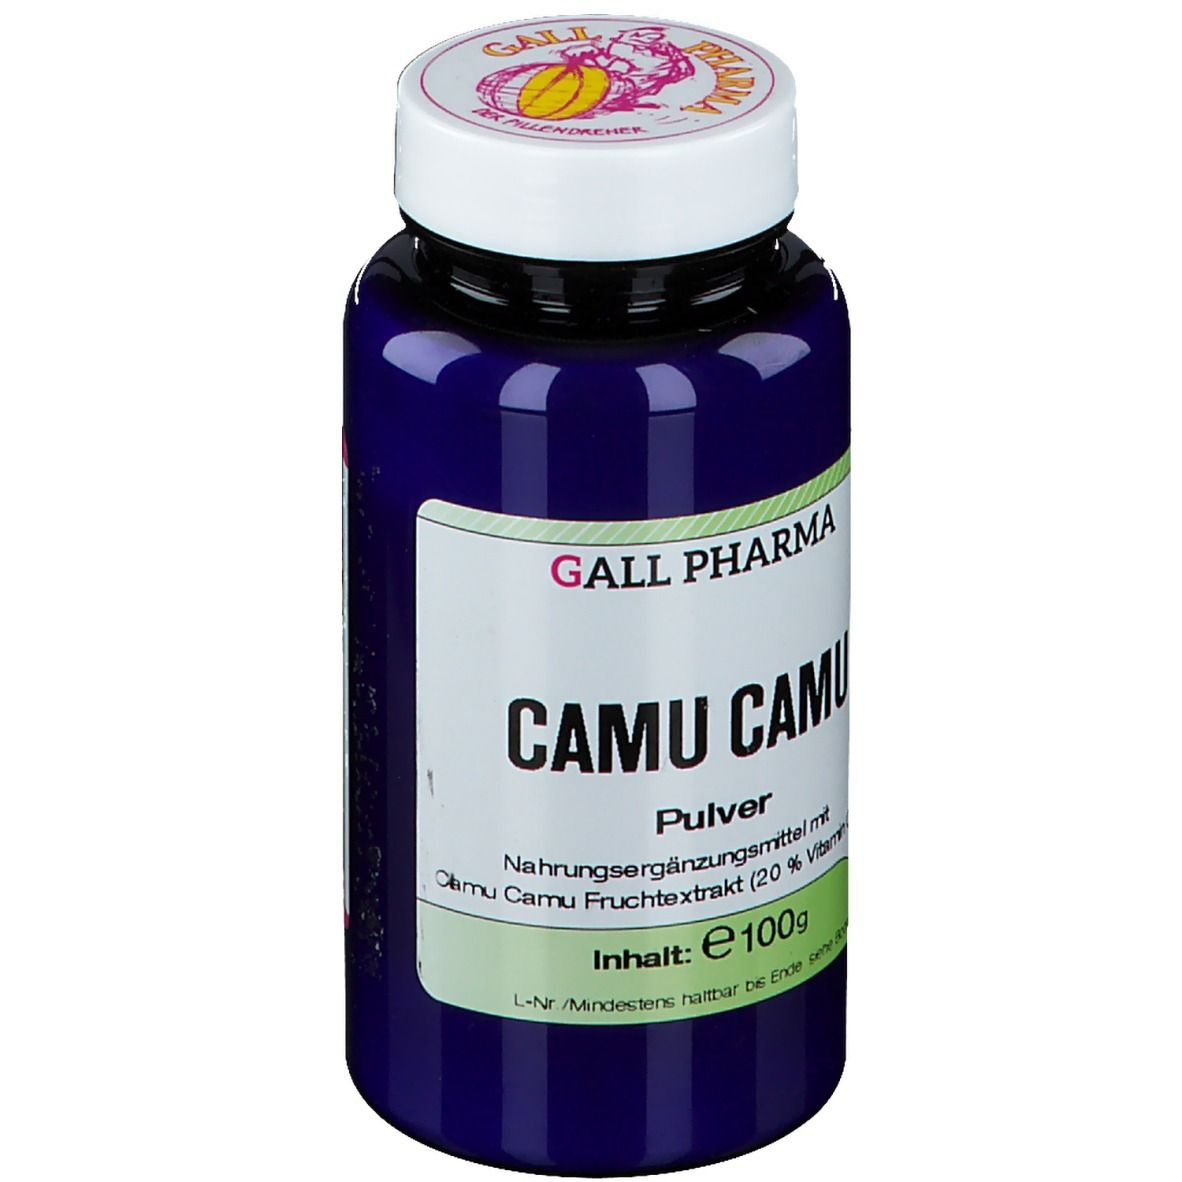 GALL PHARMA Camu Camu Pulver